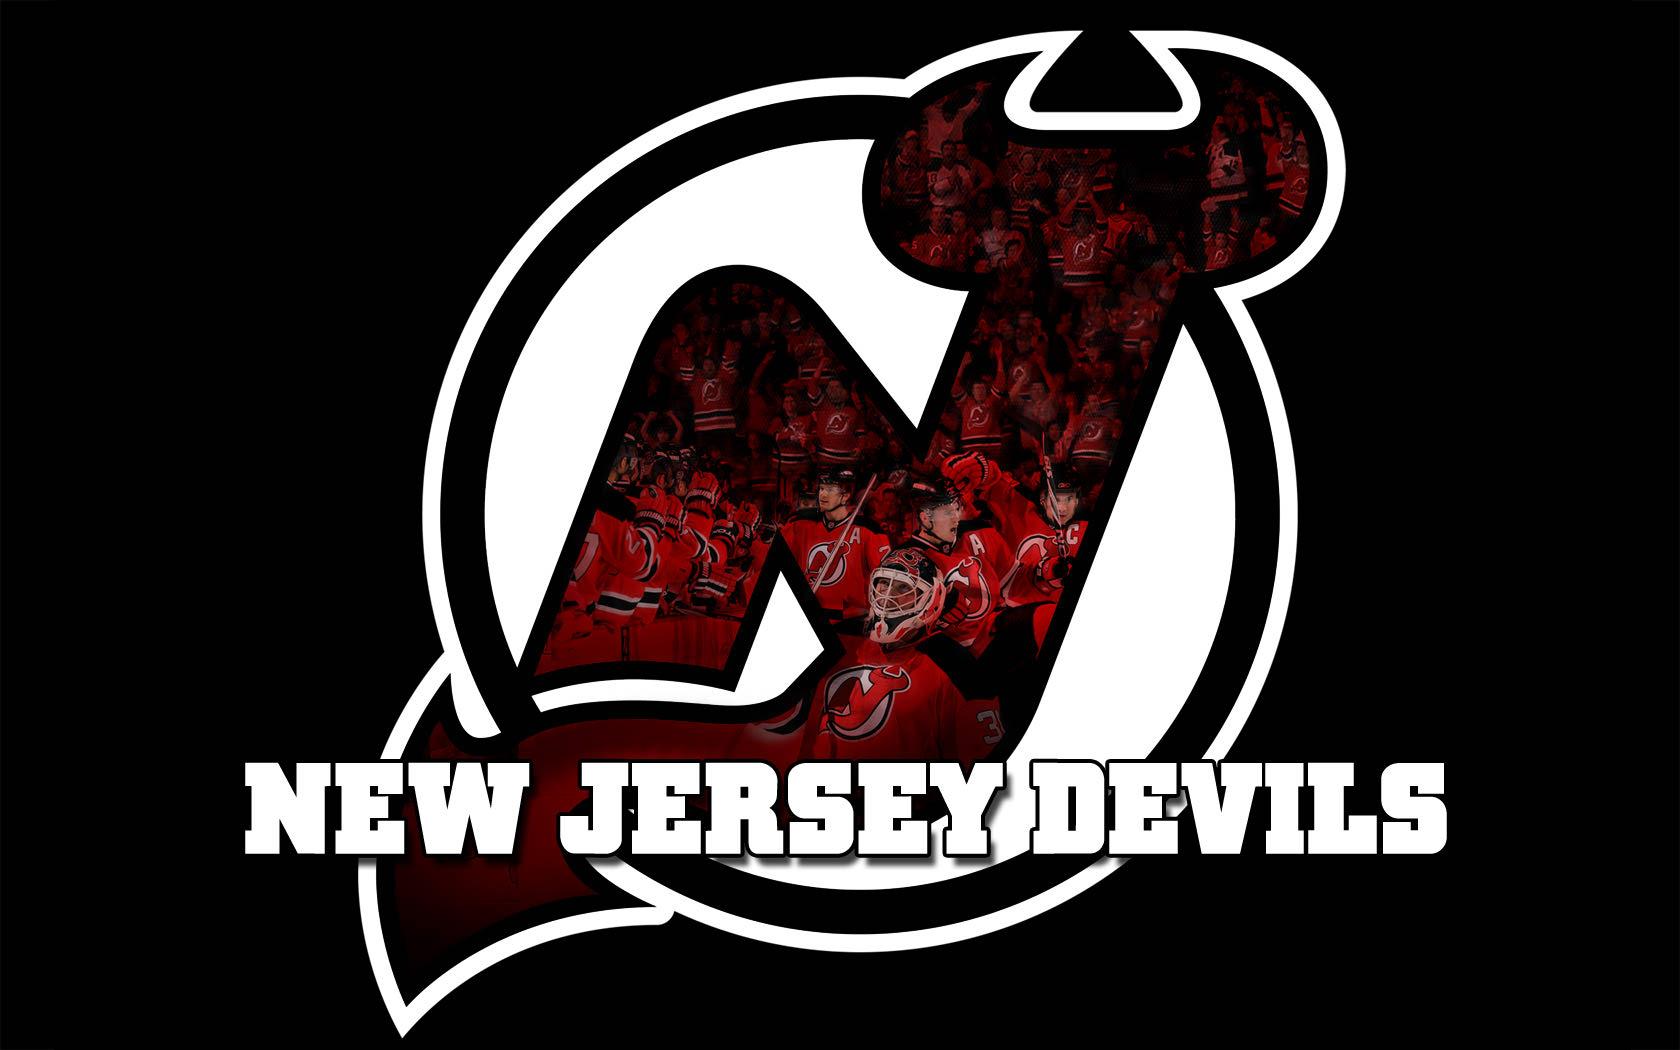 New Jersey Devils Photos Logo New Jersey Devils Photos 22049